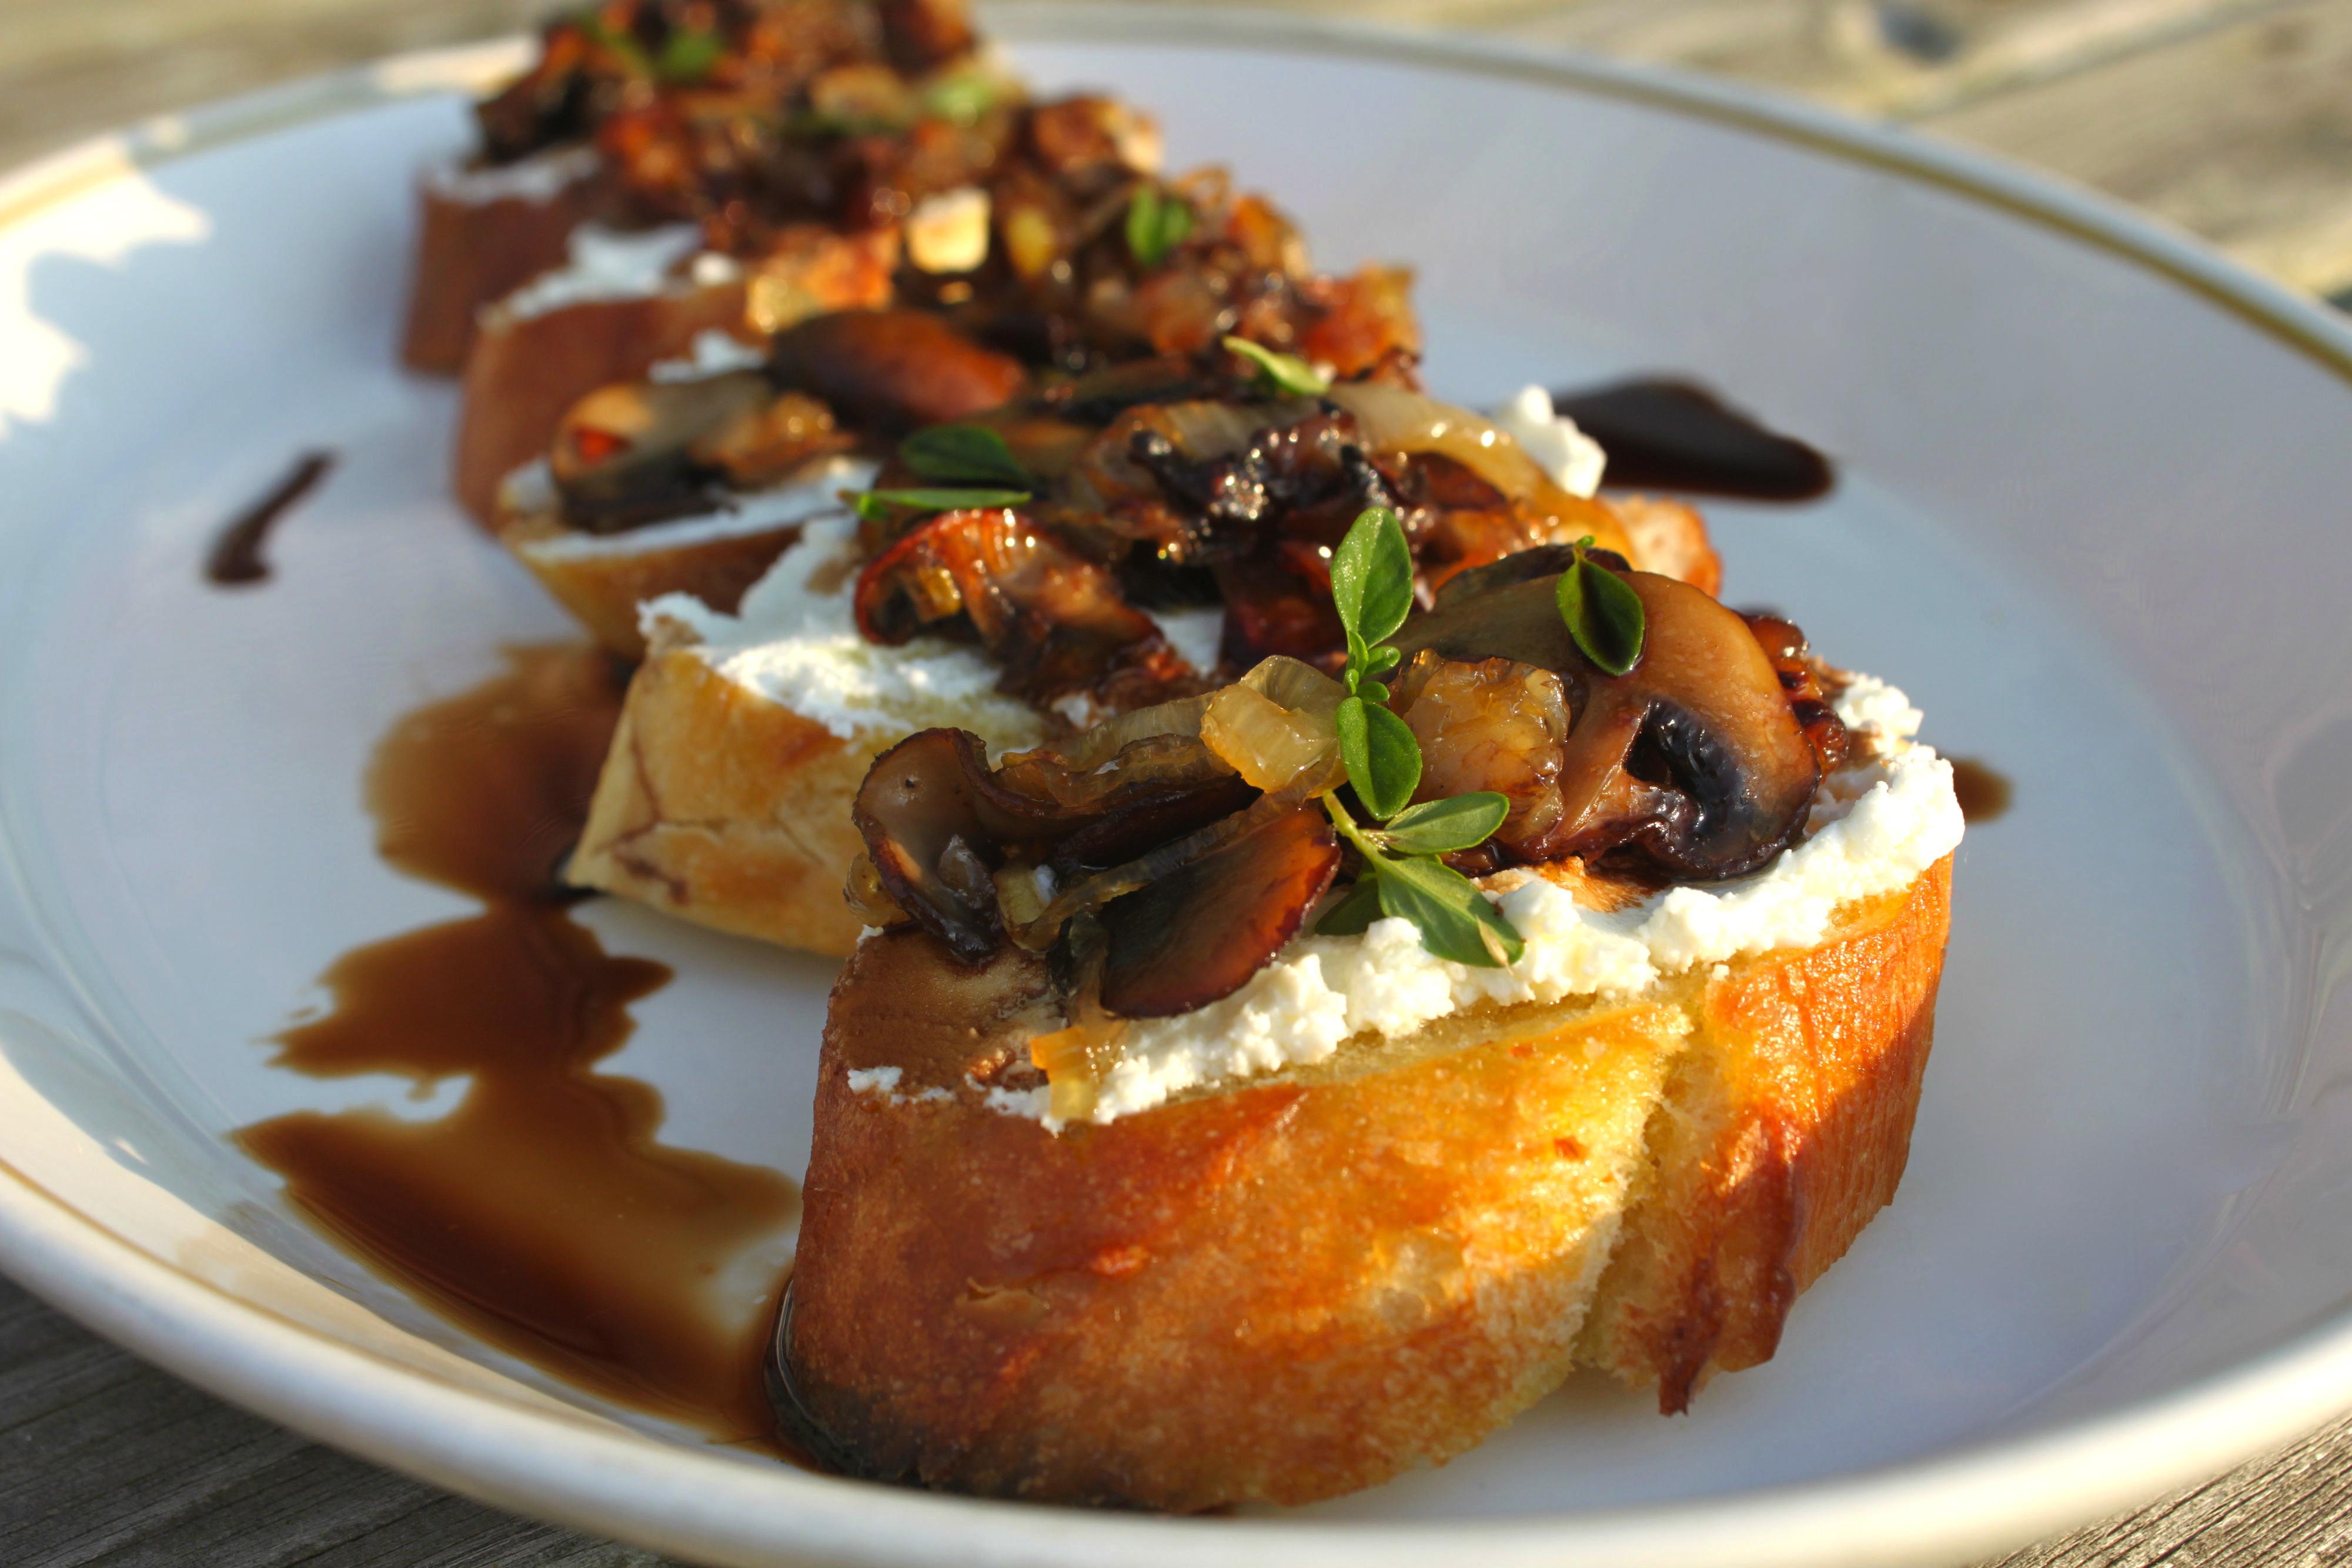 Caramelized Mushroom & Shallot Bruschetta |